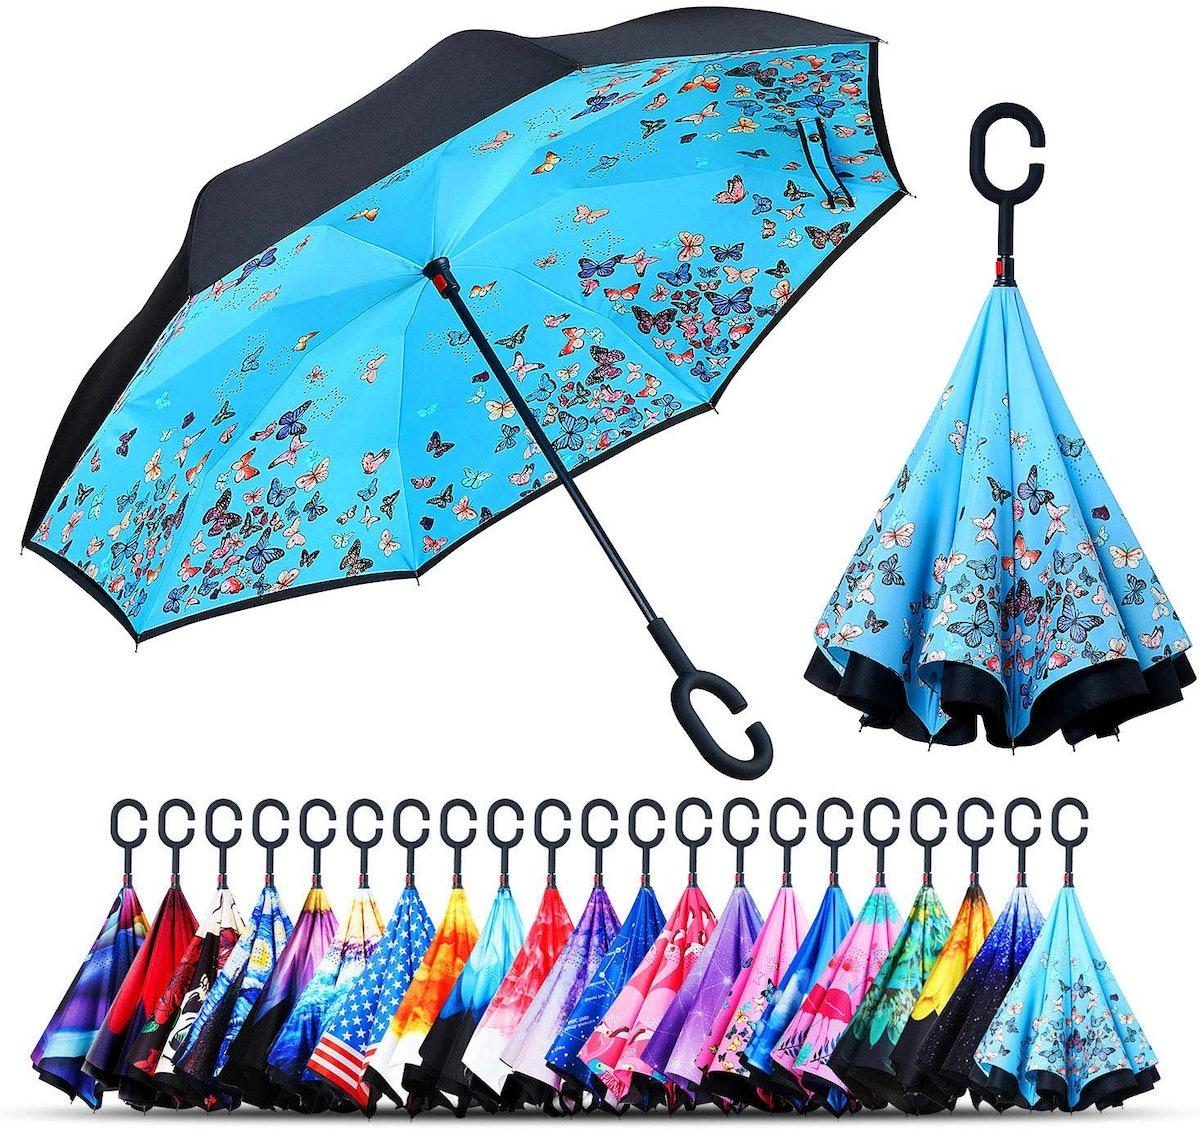 Owen Kyne Folding Inverted Umbrella